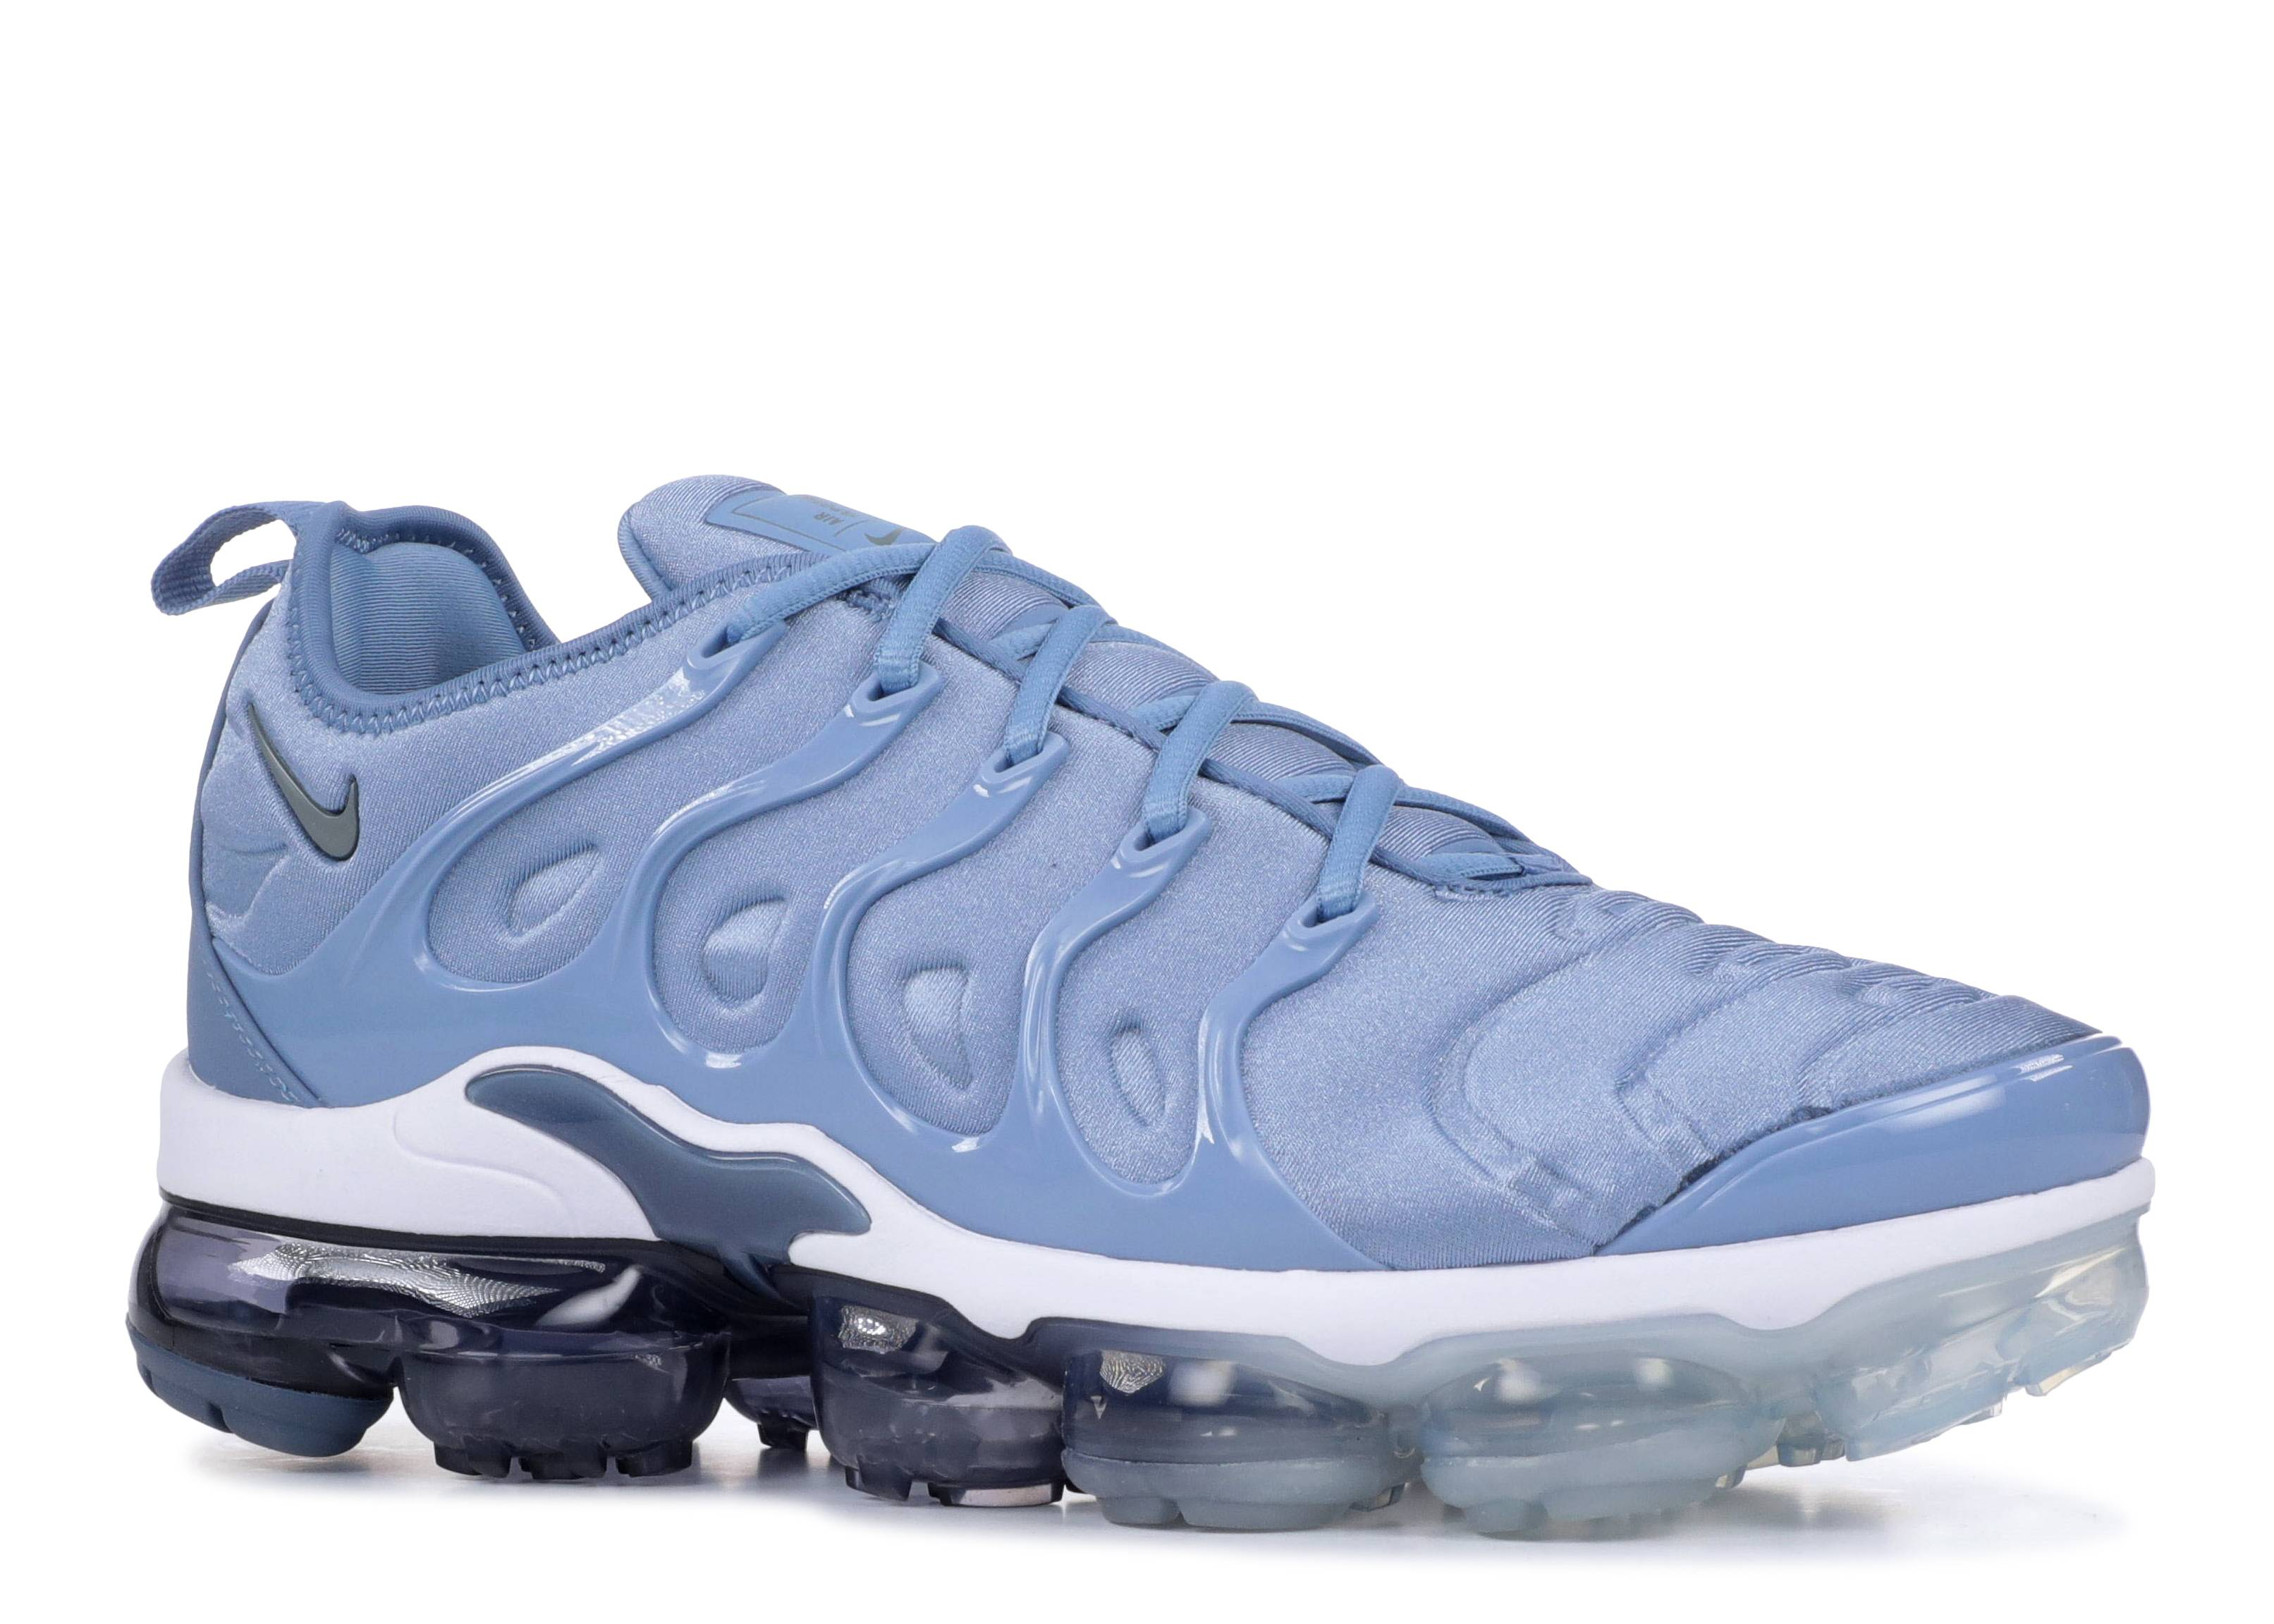 31604b79a1 Air Vapormax Plus - Nike - 924453 402 - work blue/cool grey   Flight Club